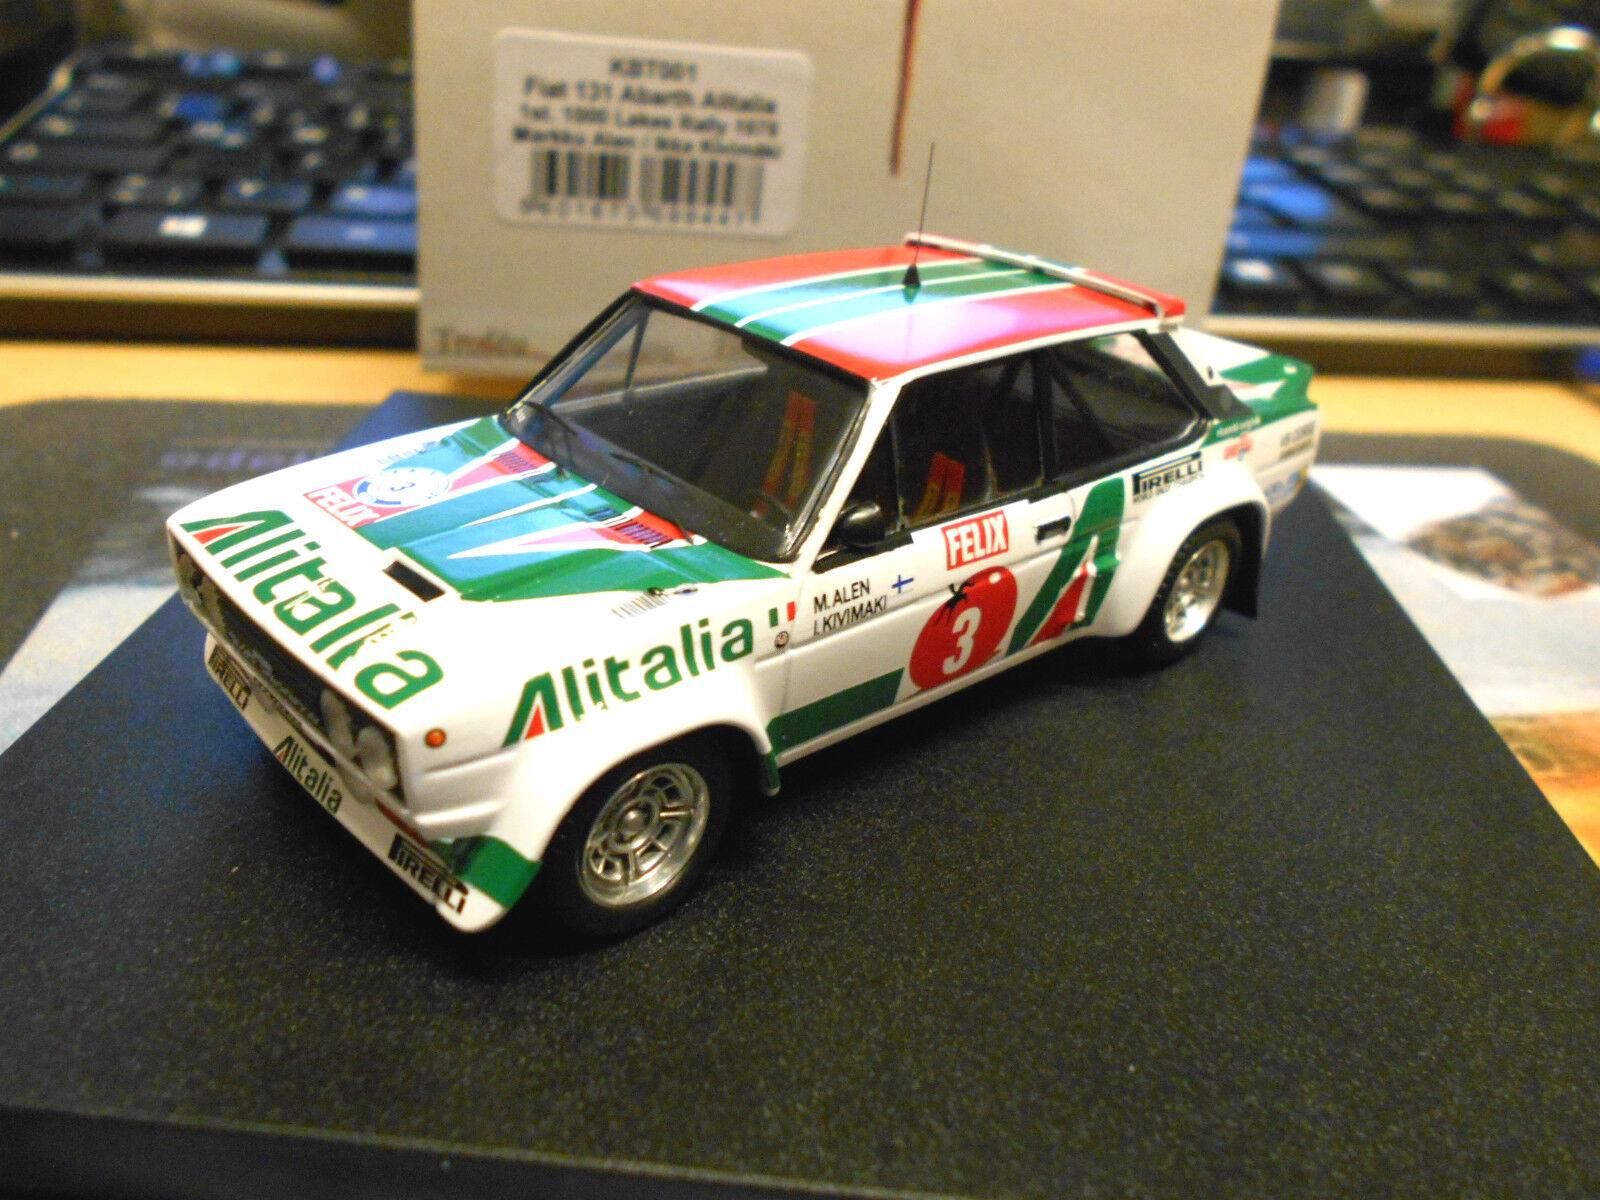 FIAT 131 ABARTH RALLY WM 1000 Lakes 1978 Alen WINNER Finland Limit Trofeu 1:43